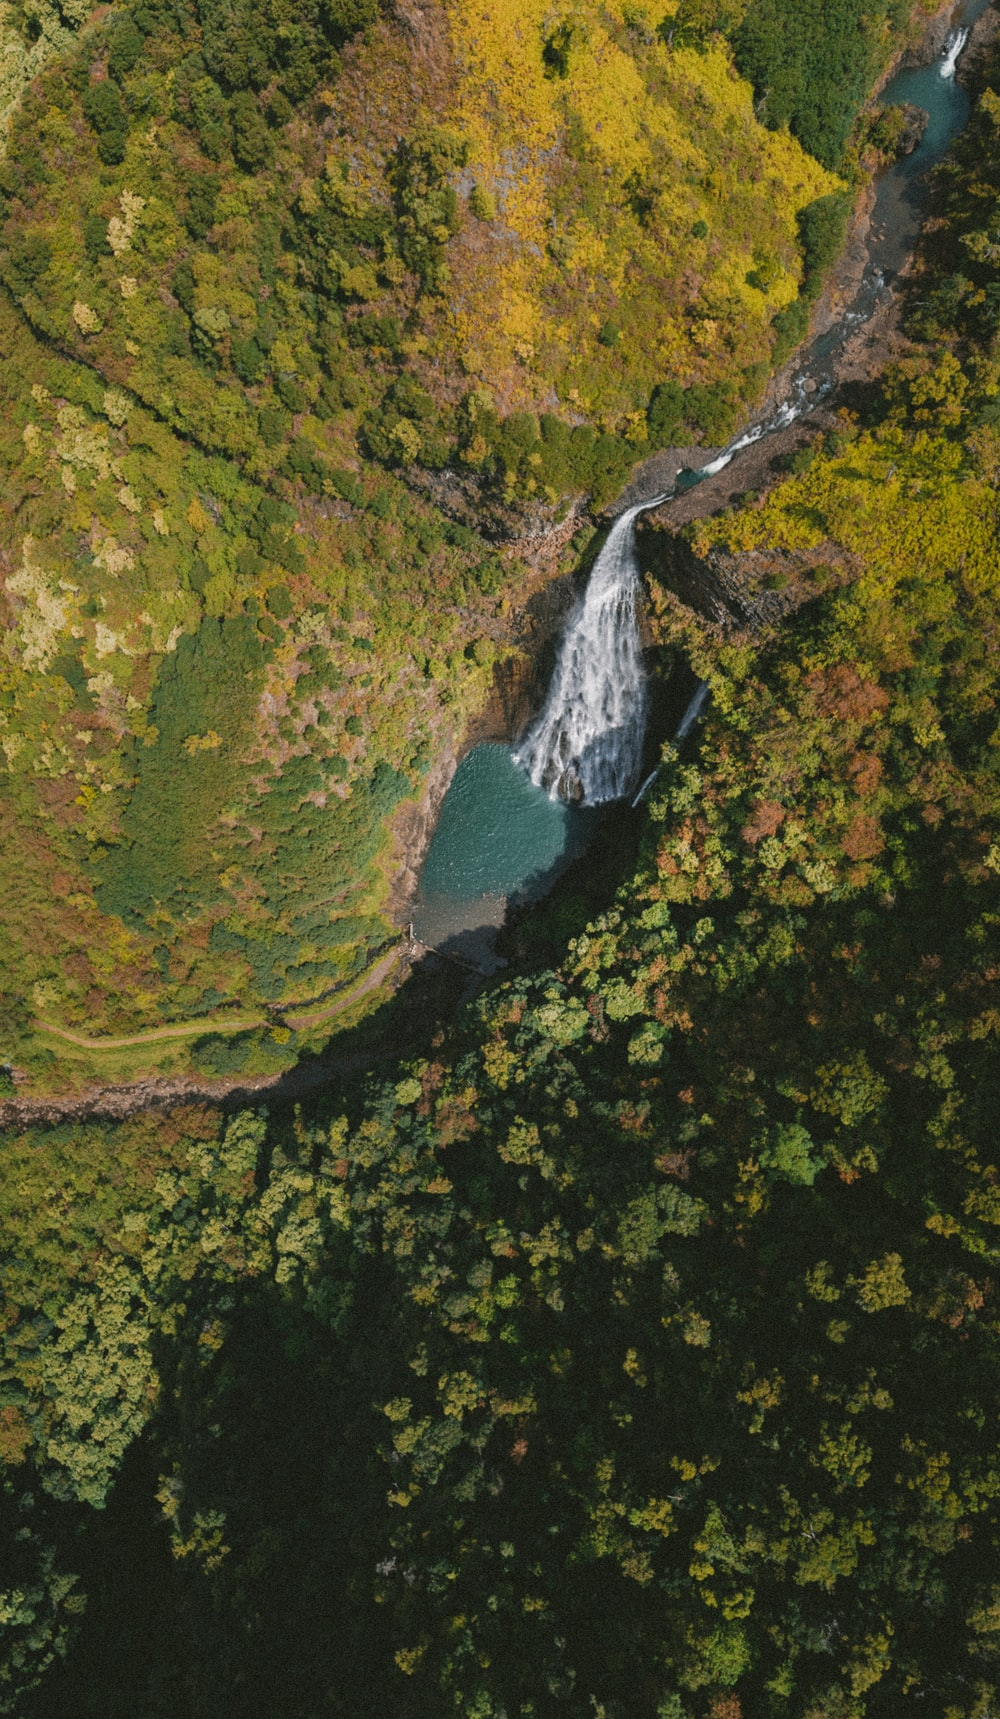 bird's eye view of flowing waterfalls between mountains